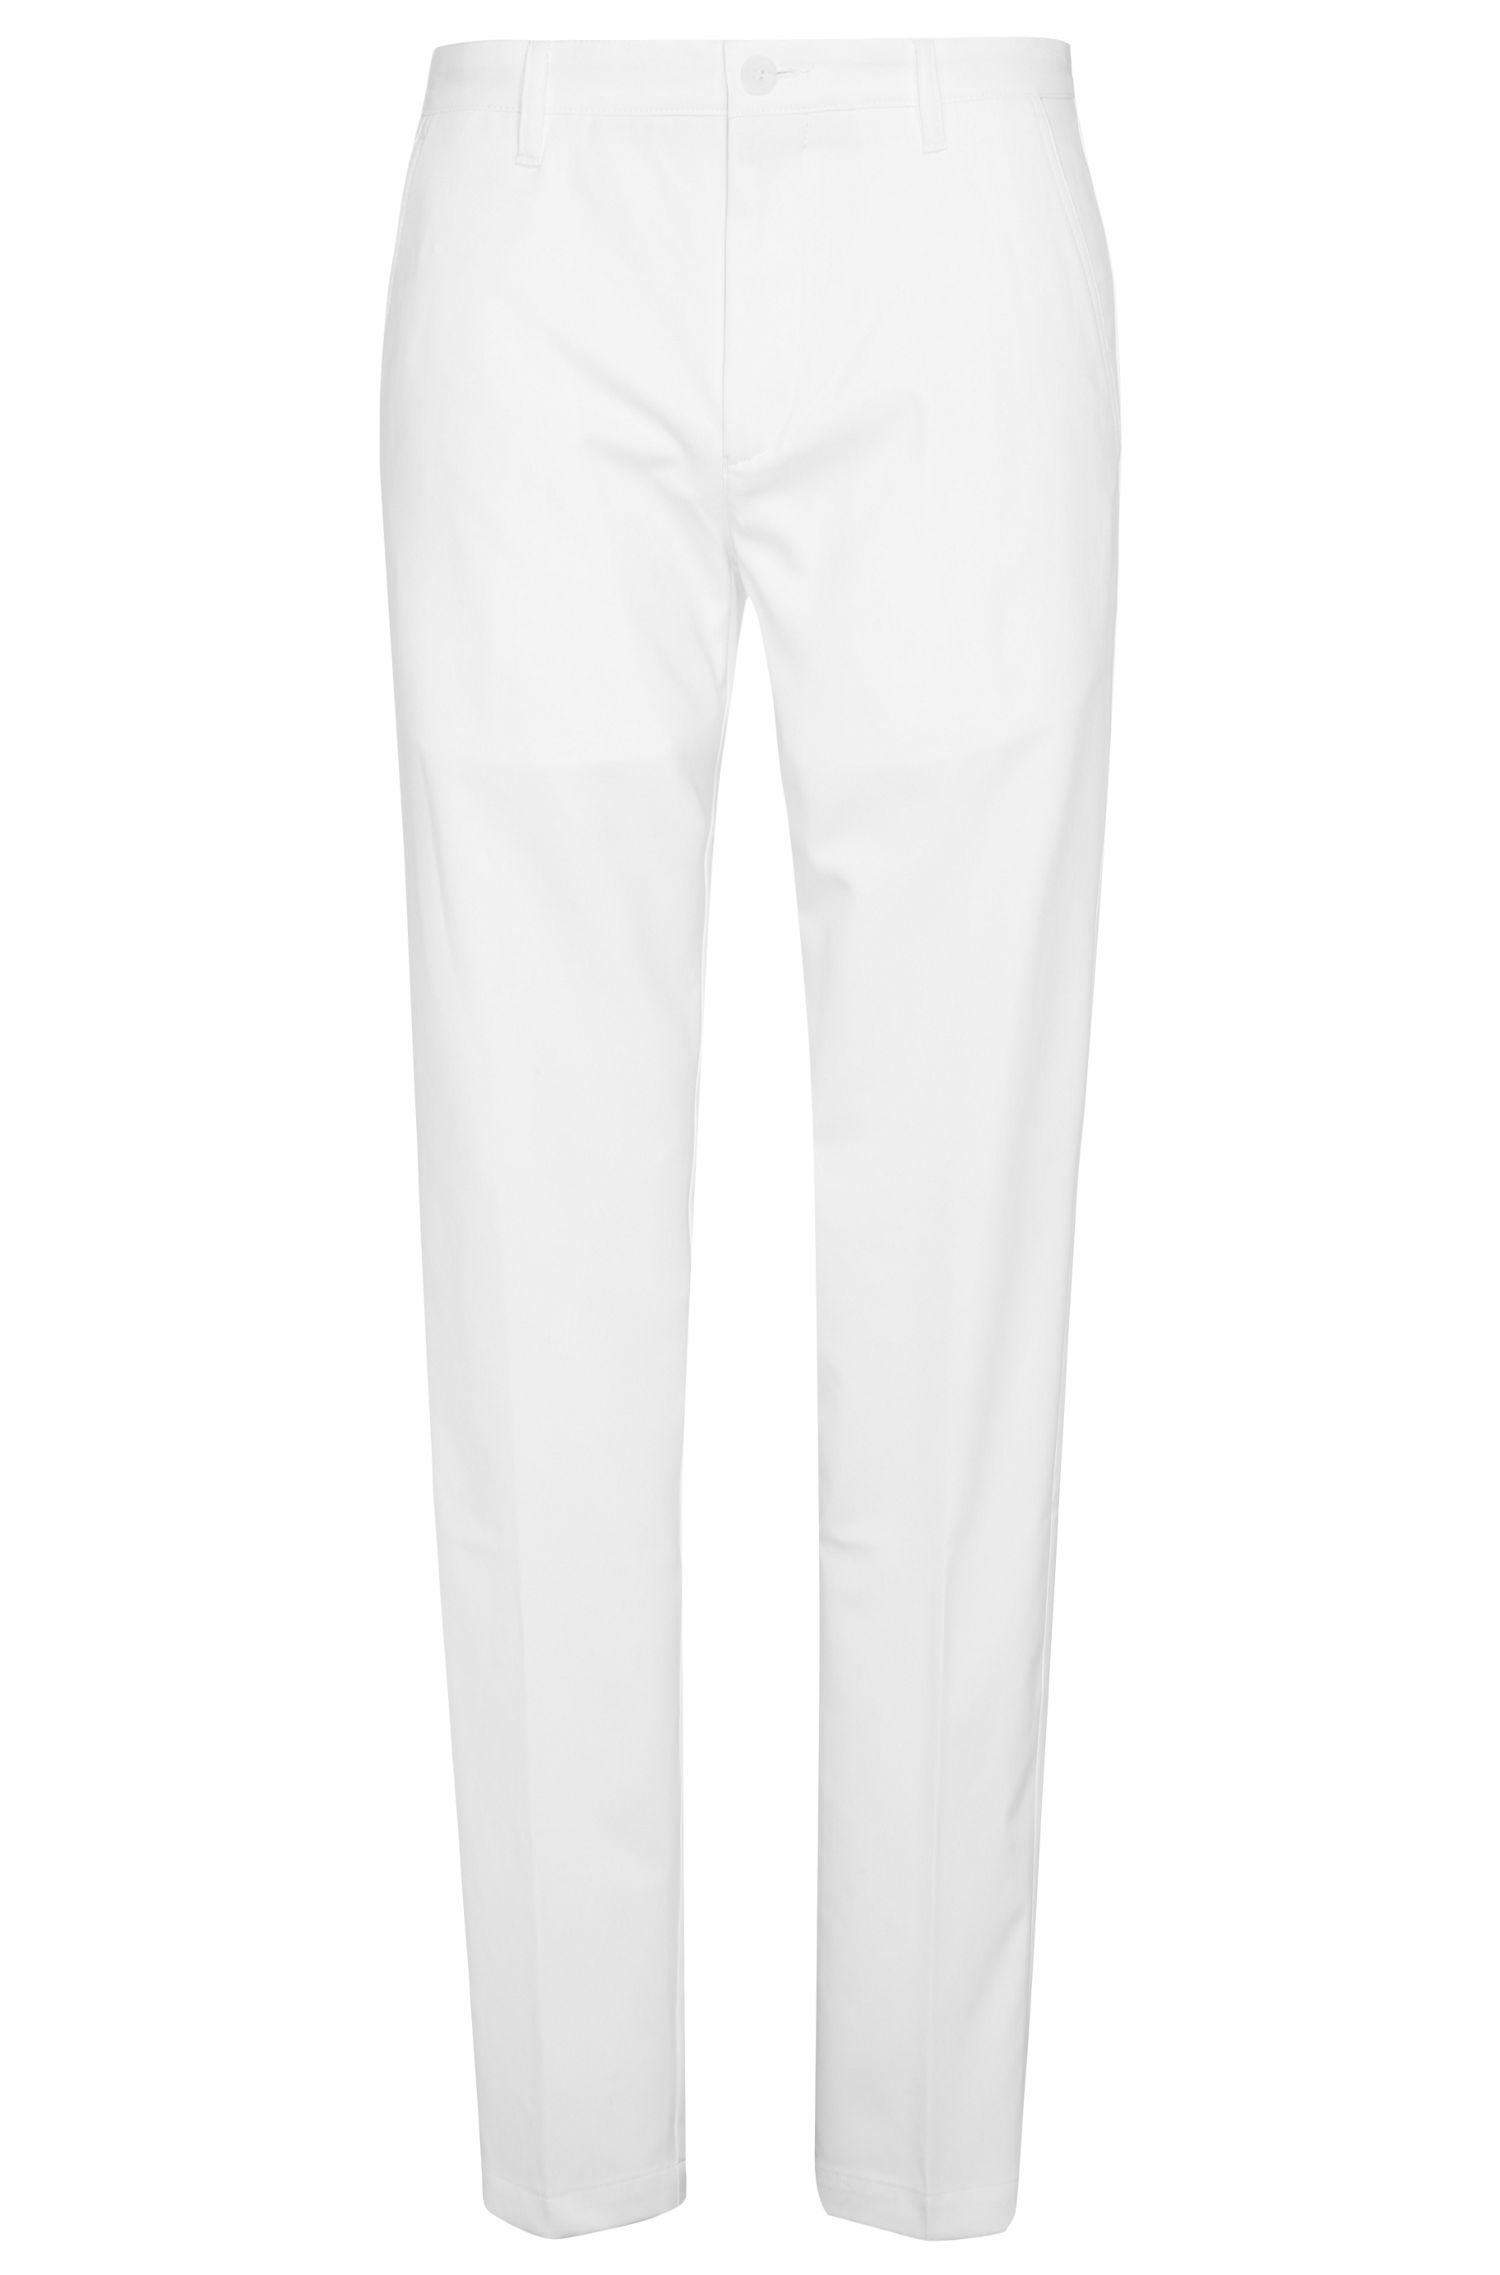 Pantalón slim fit en tejido suave: 'Hakan 9', Blanco